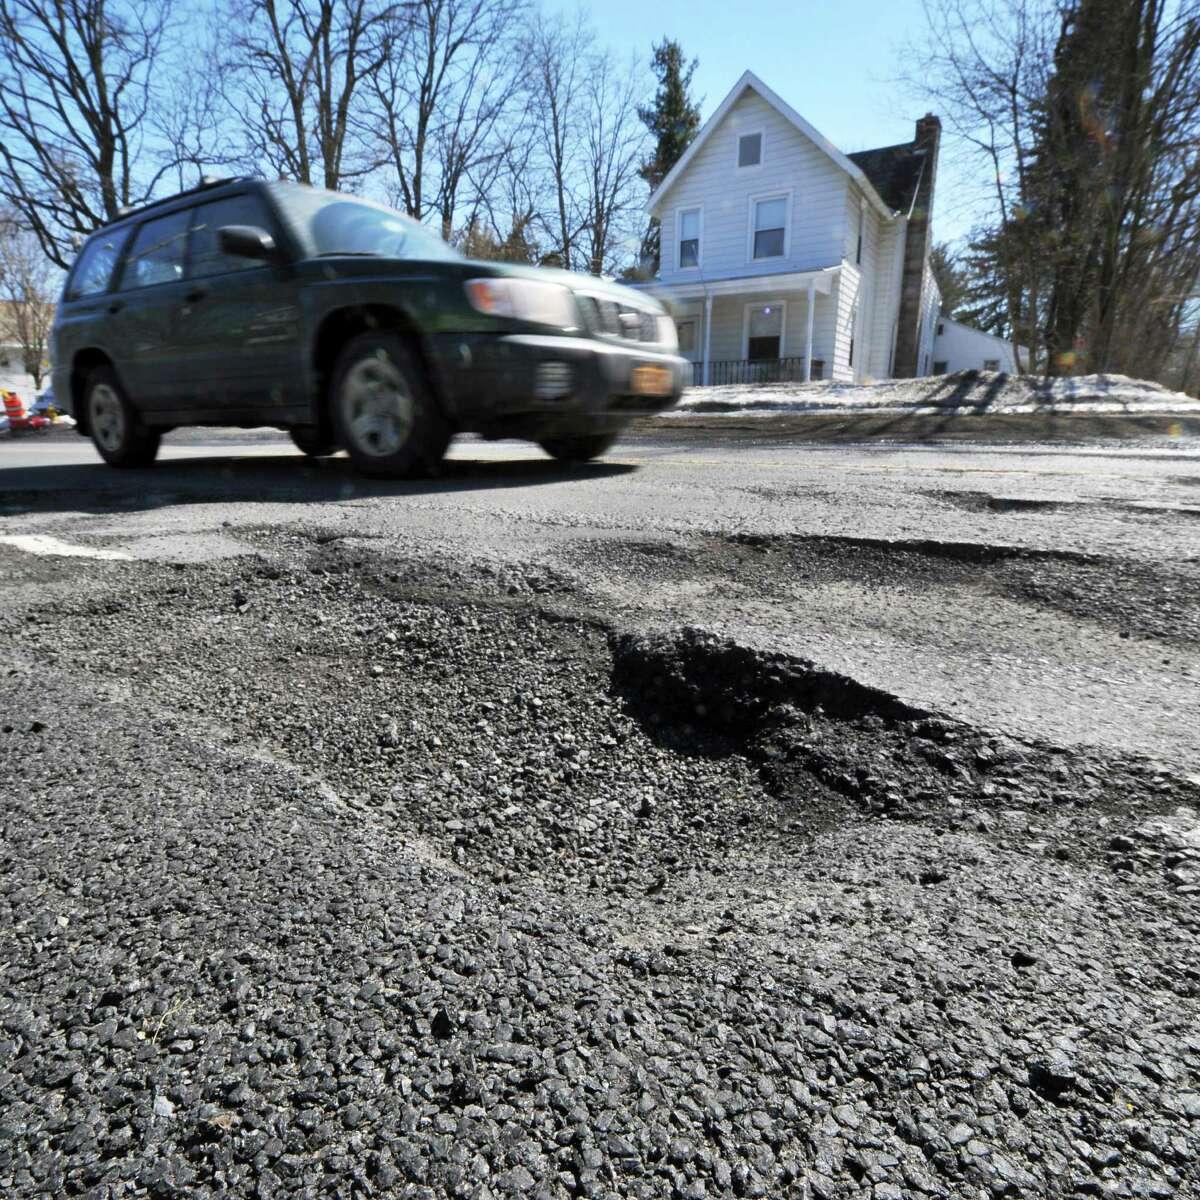 Potholes on Kenwood Avenue near Gardiner Terrace Tuesday March 18, 2014, in Bethlehem, NY. (John Carl D'Annibale / Times Union)